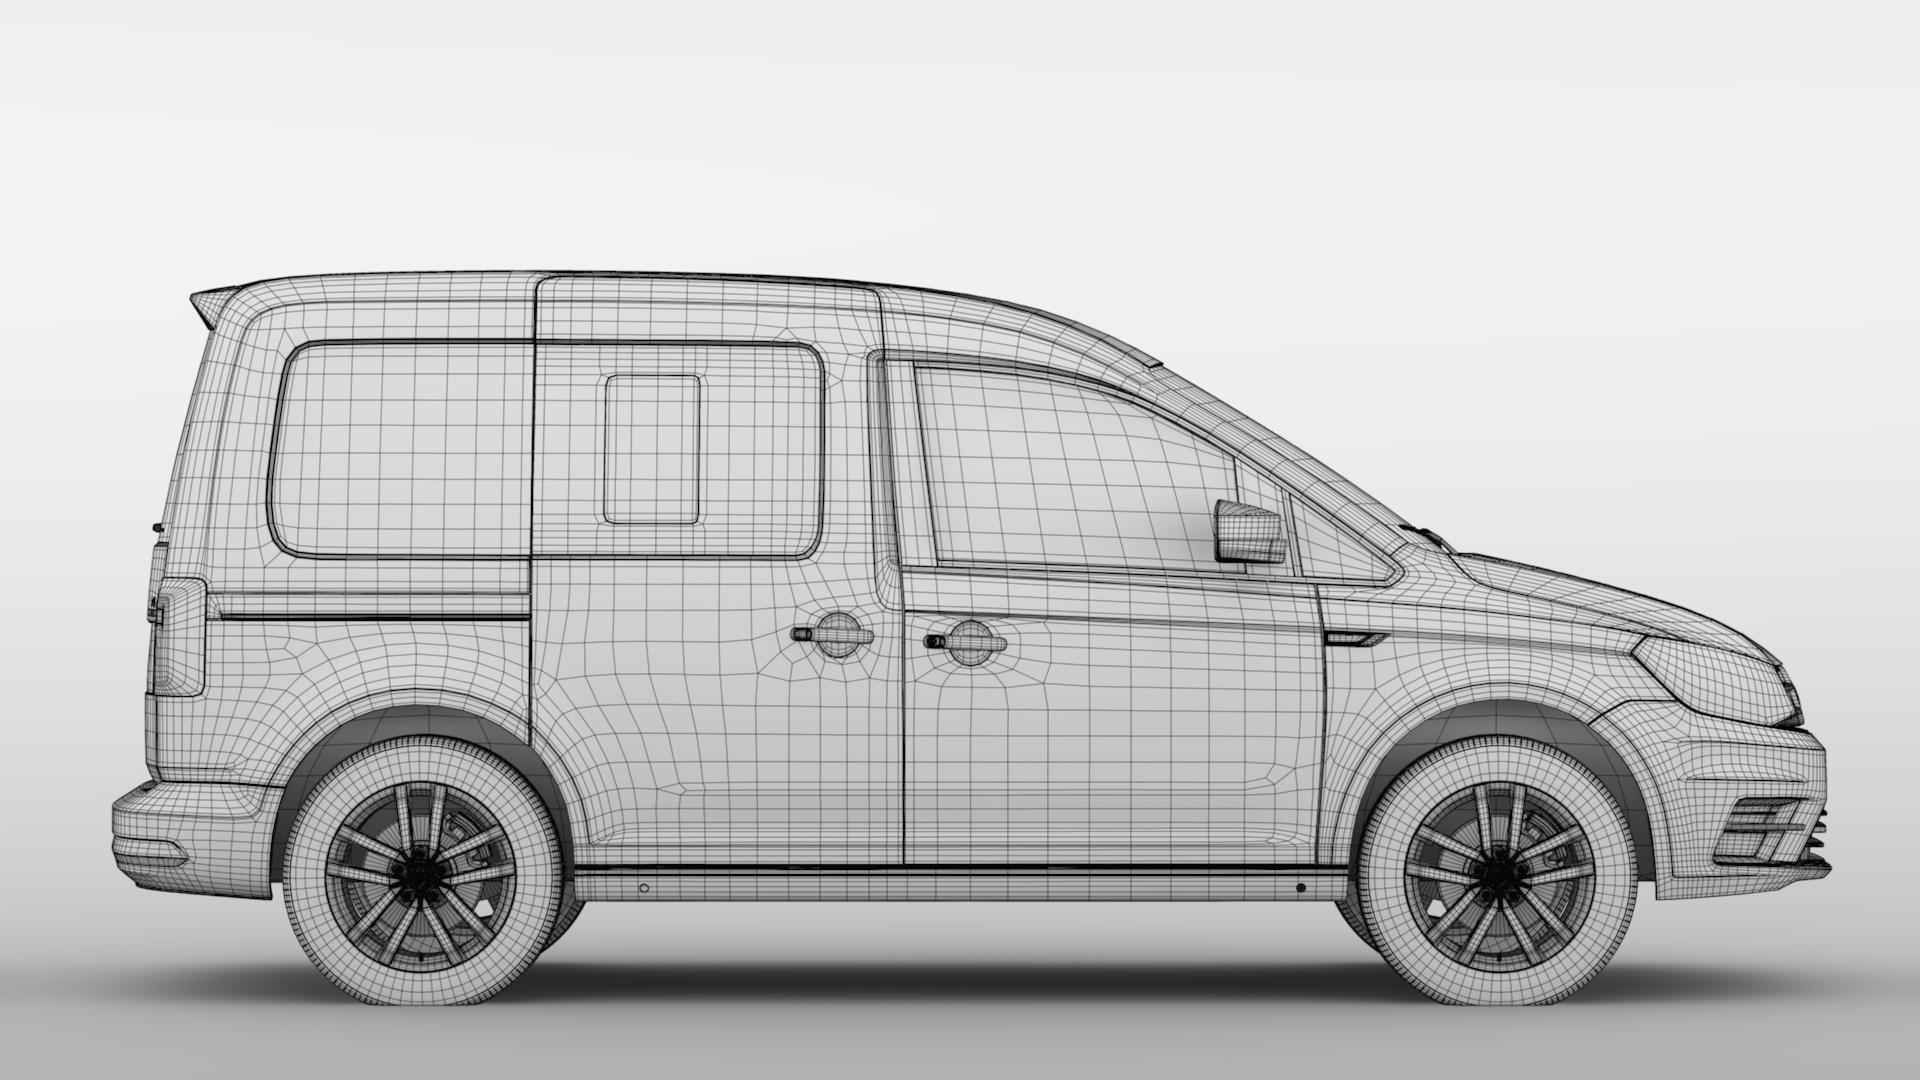 volkswagen caddy 2018 3d model max fbx c4d lwo ma mb hrc xsi obj 283813